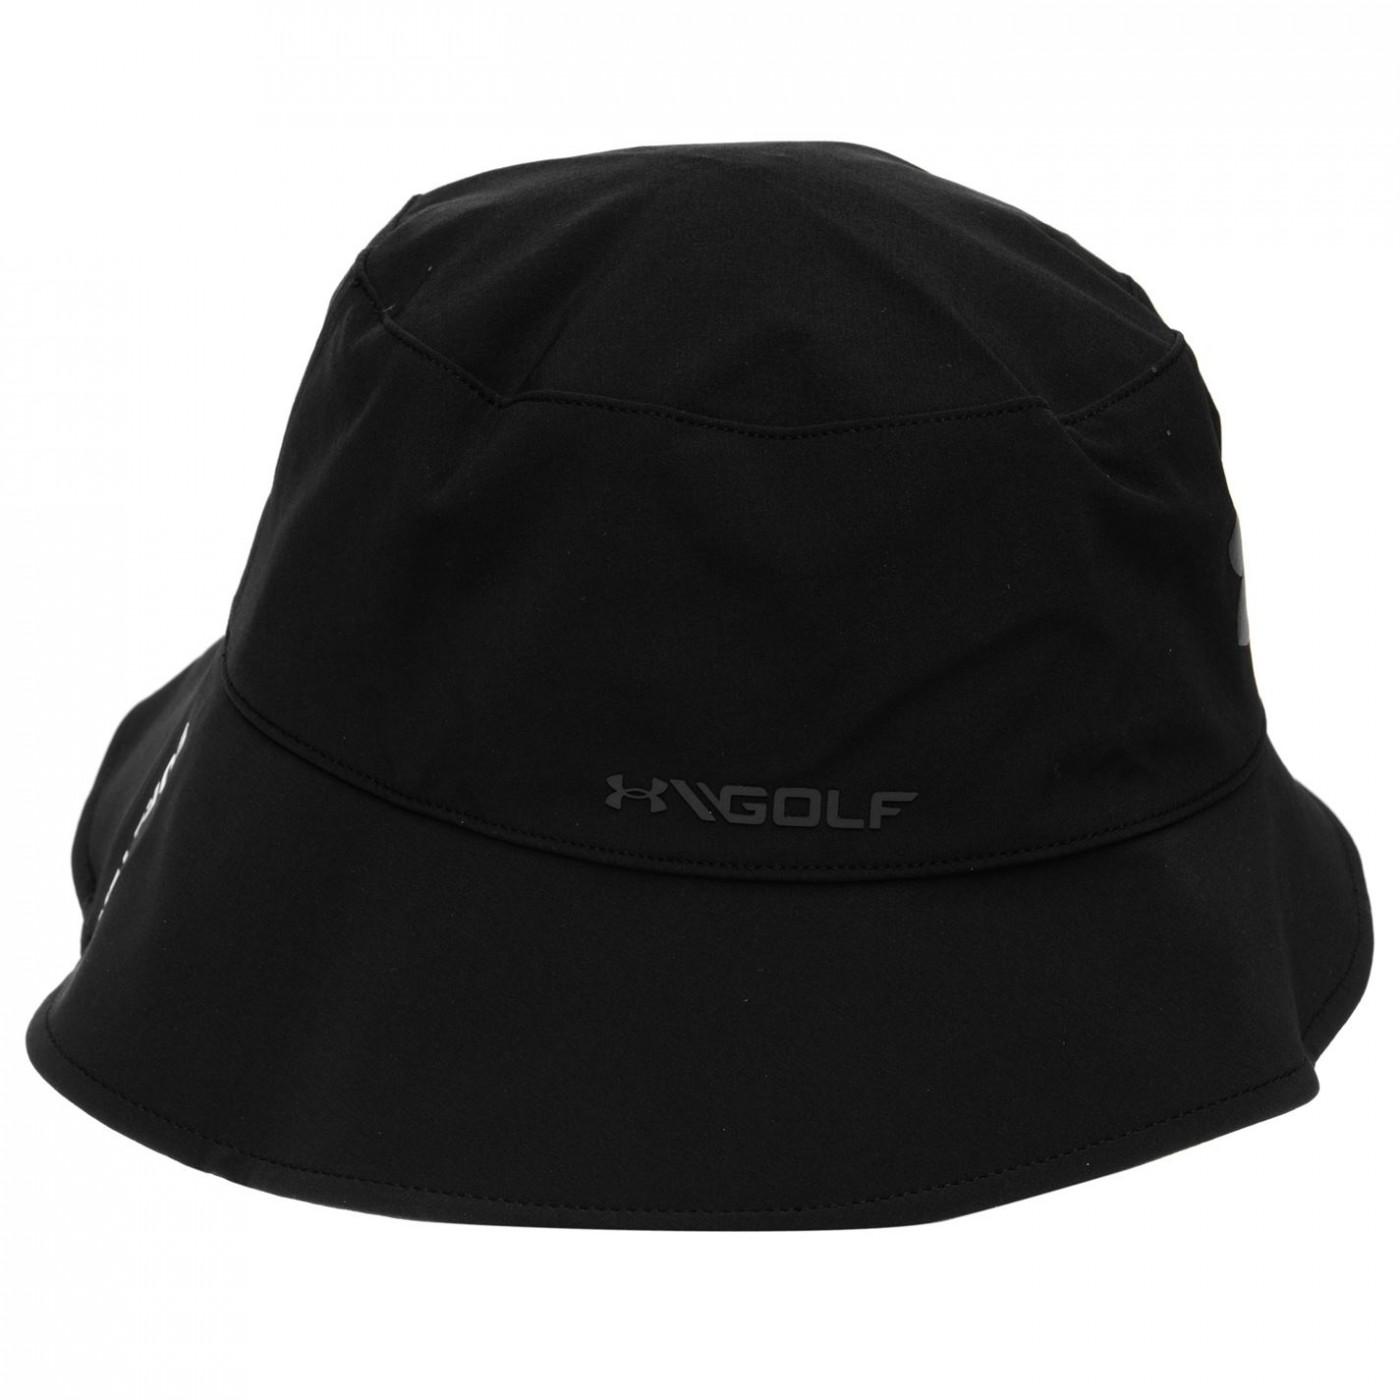 Kačket Under Armour - Gore Tex Bucket Hat 73 - Jeftinije.hr ef2b29263f91